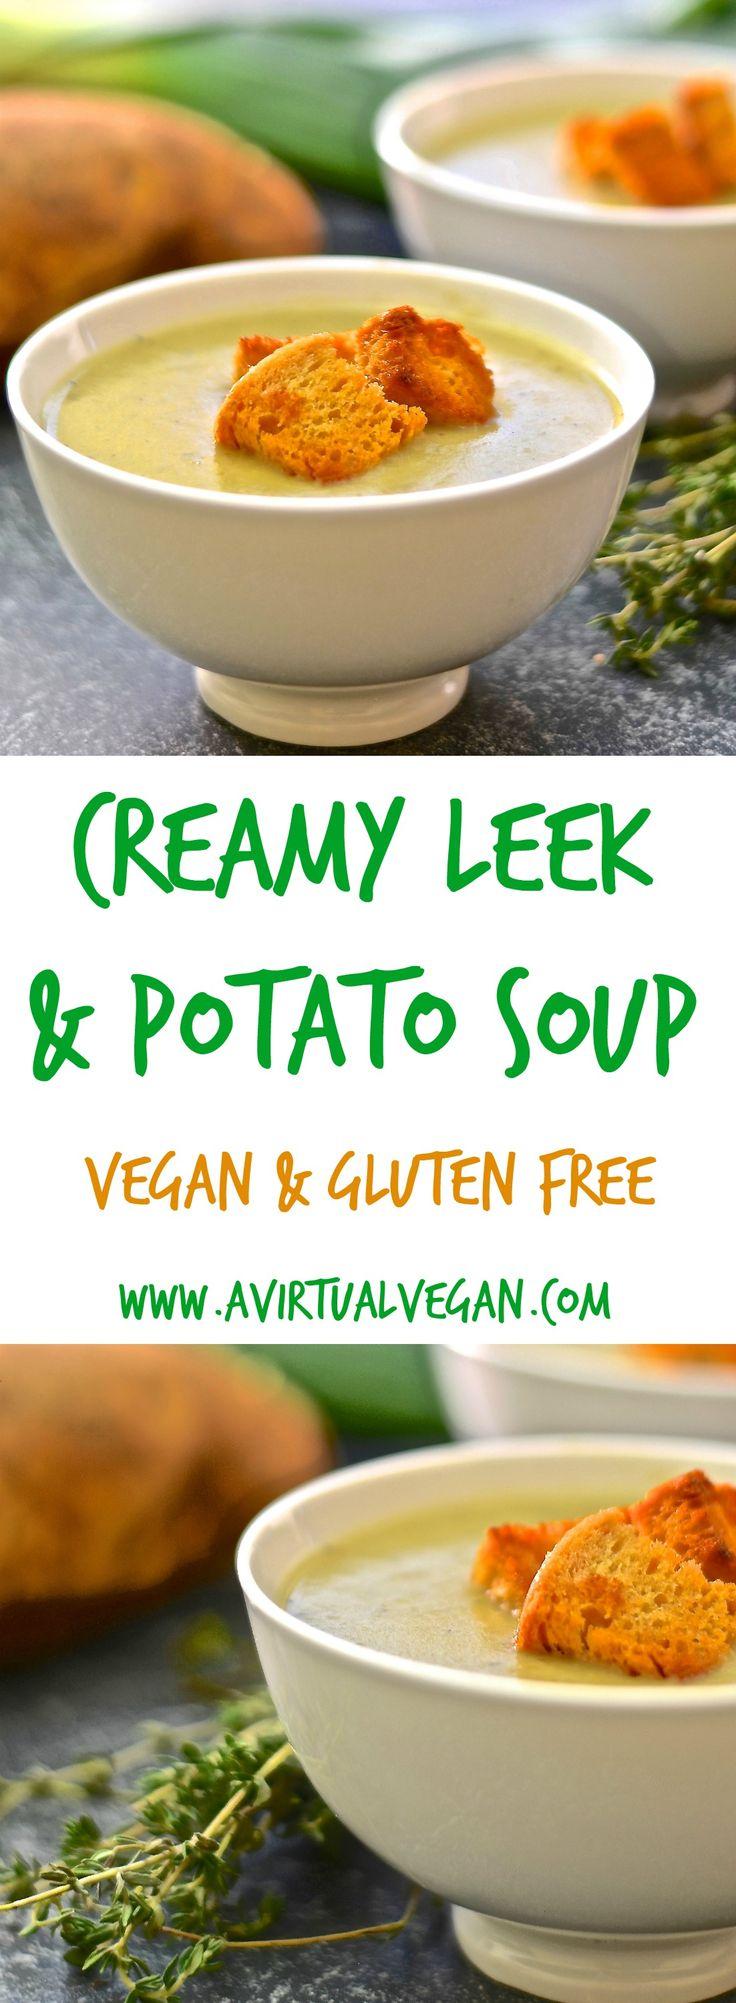 of nutmeg combine to make this unbelievably creamy Leek & Potato Soup ...